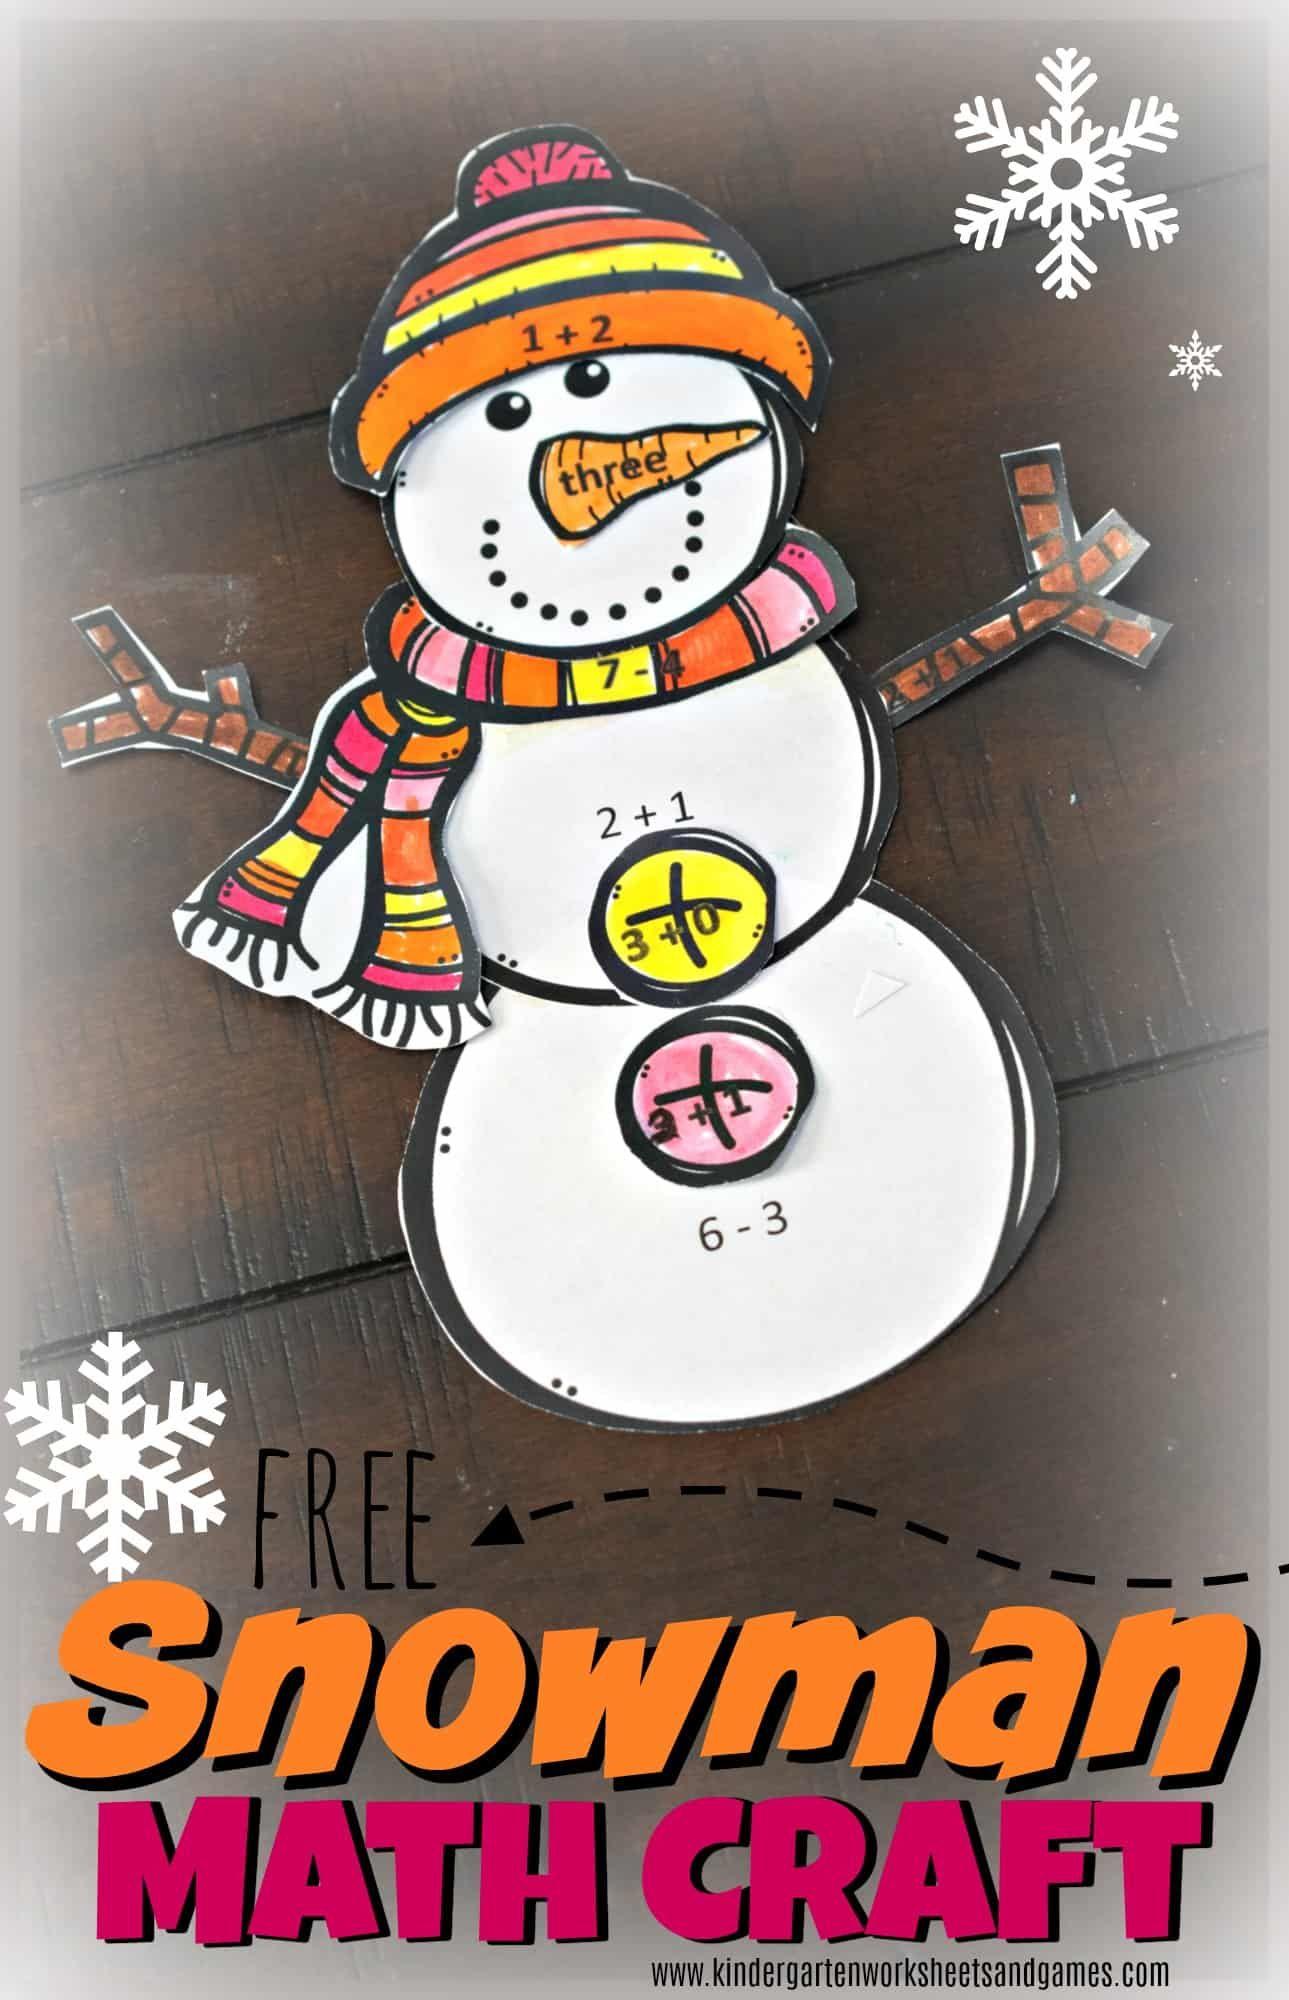 Free Snowman Math Craft